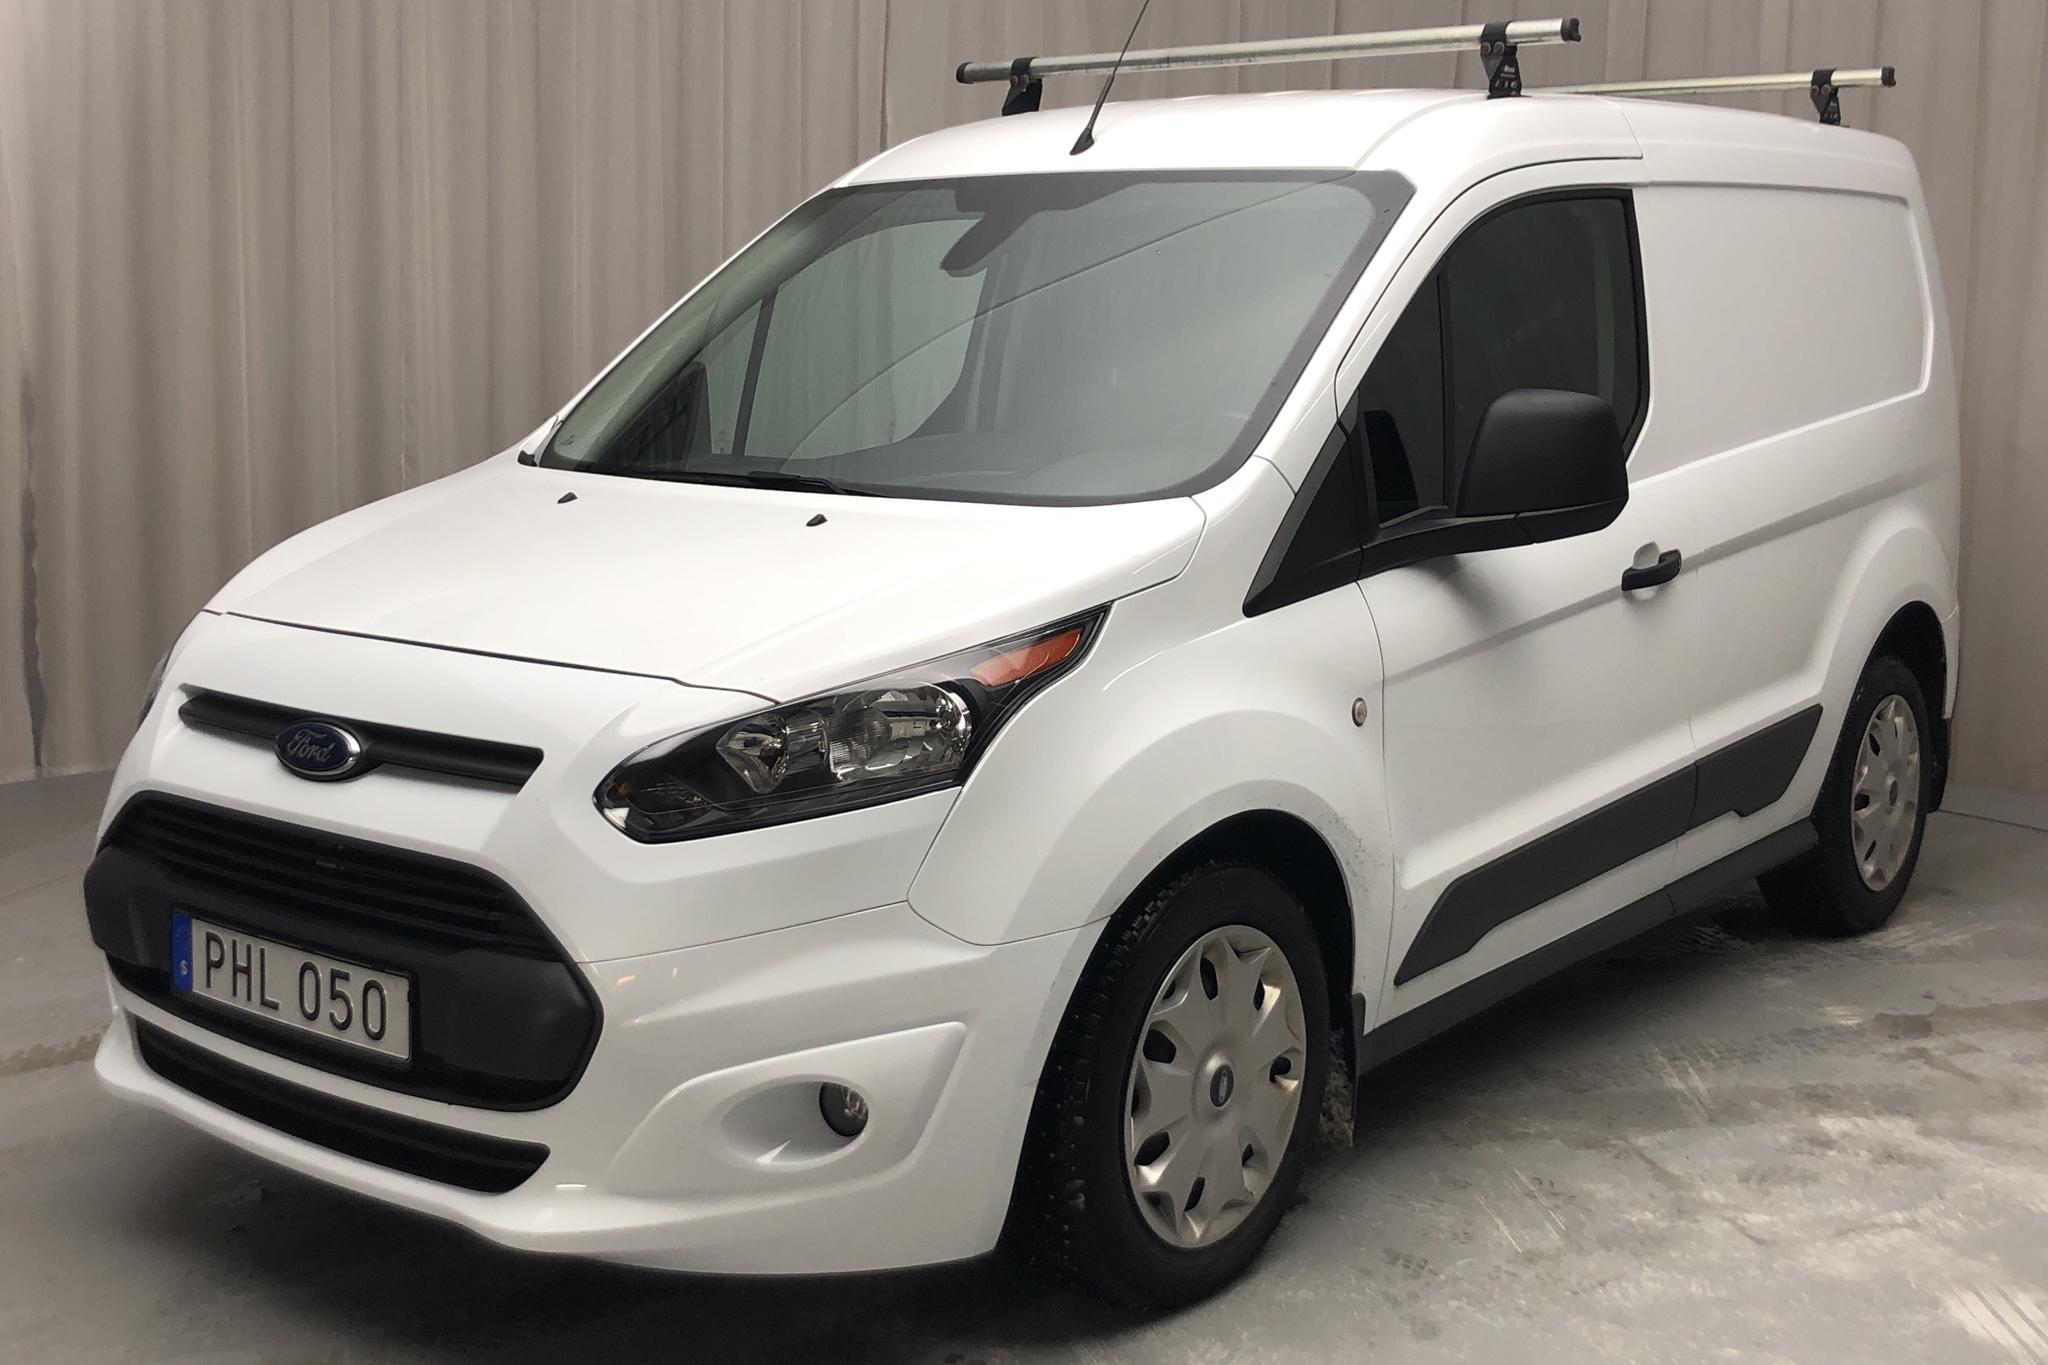 Ford Transit Connect 1.5 TDCi (100hk) - 51 830 km - Manual - white - 2017